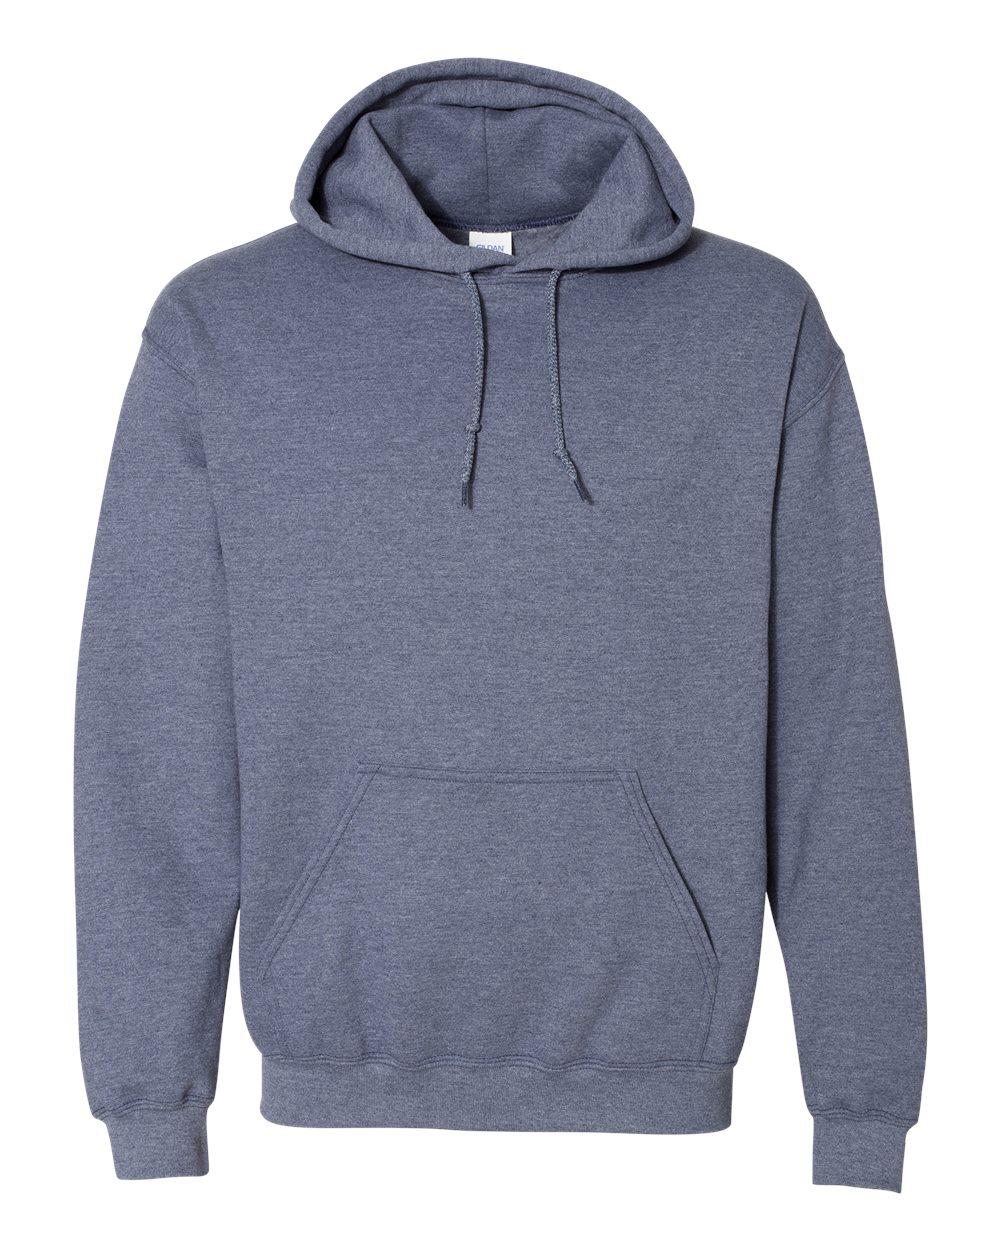 Gildan-Mens-Blank-Hoodie-Heavy-Blend-Hooded-Sweatshirt-18500-up-to-5XL thumbnail 27